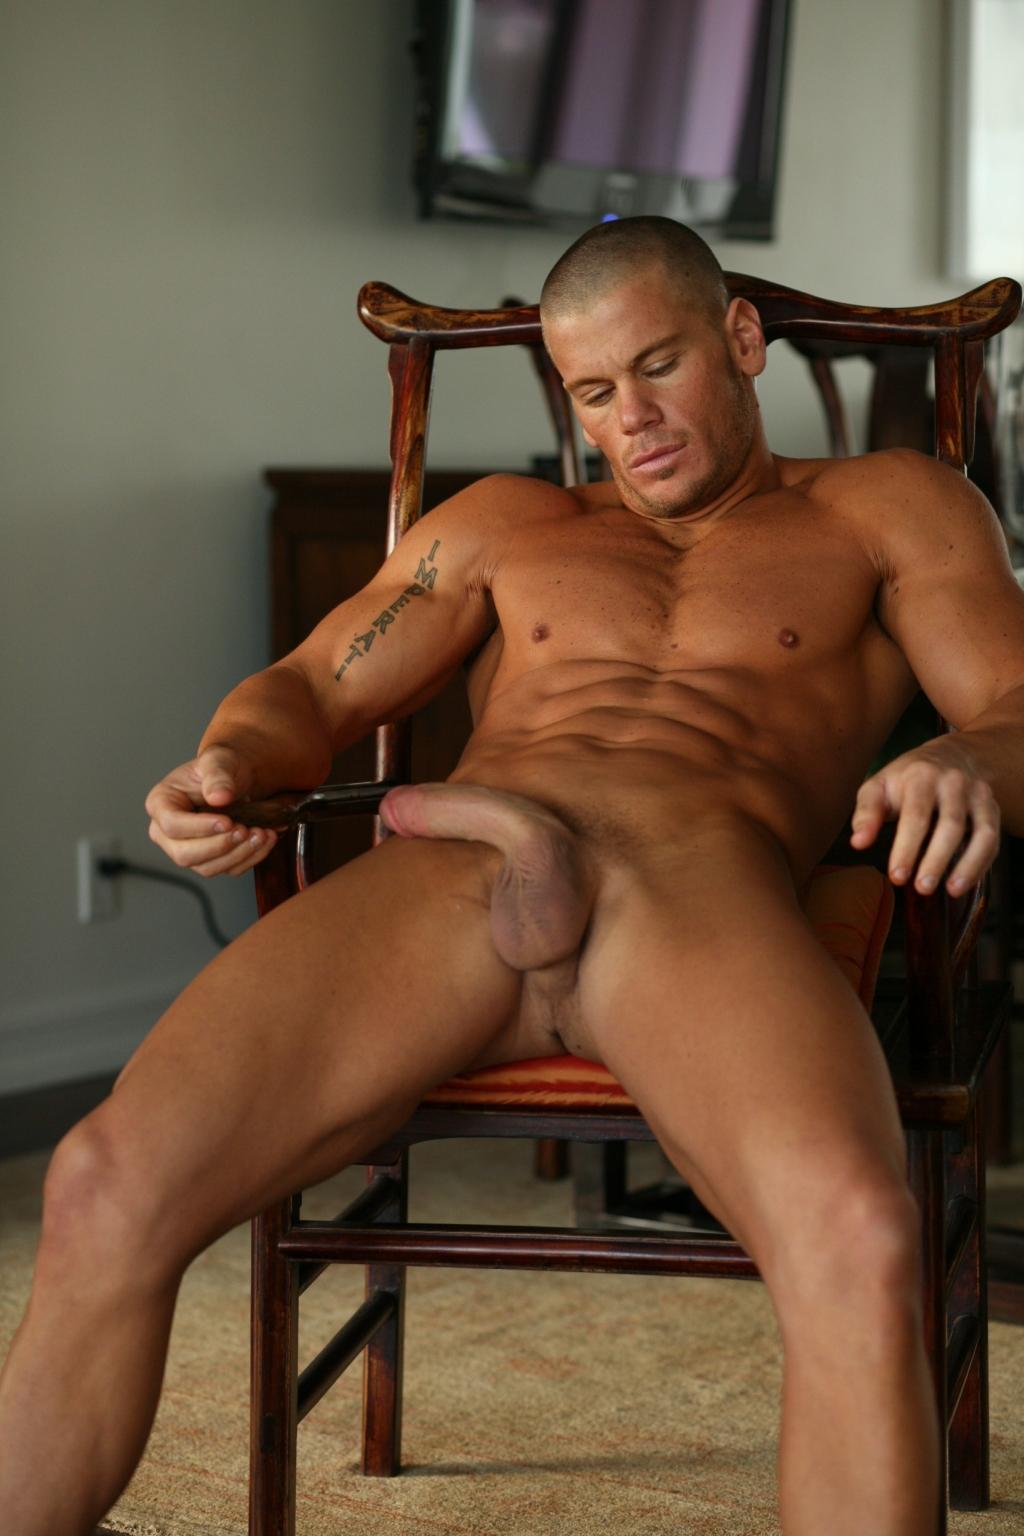 Sexy pictures of men vamires naked hardcore pornstar